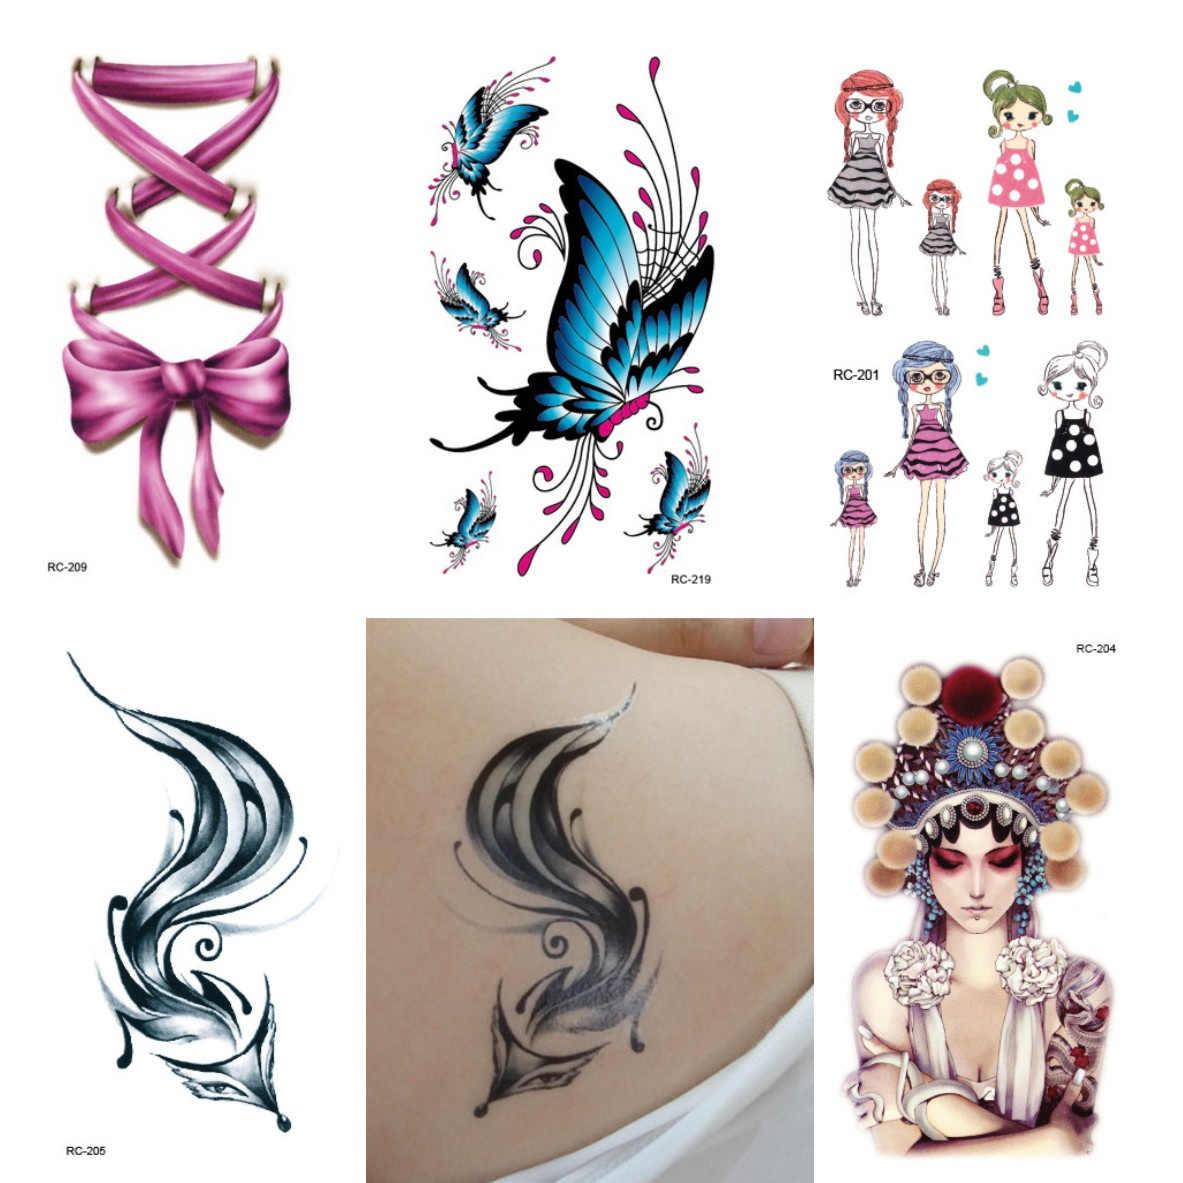 5 Pcs Random Small Temporary Children Tattoo Sticker Bird Fox Horse Dolphin Animal Designs Body Art Tattoos For Male And Female Temporary Tattoos Aliexpress